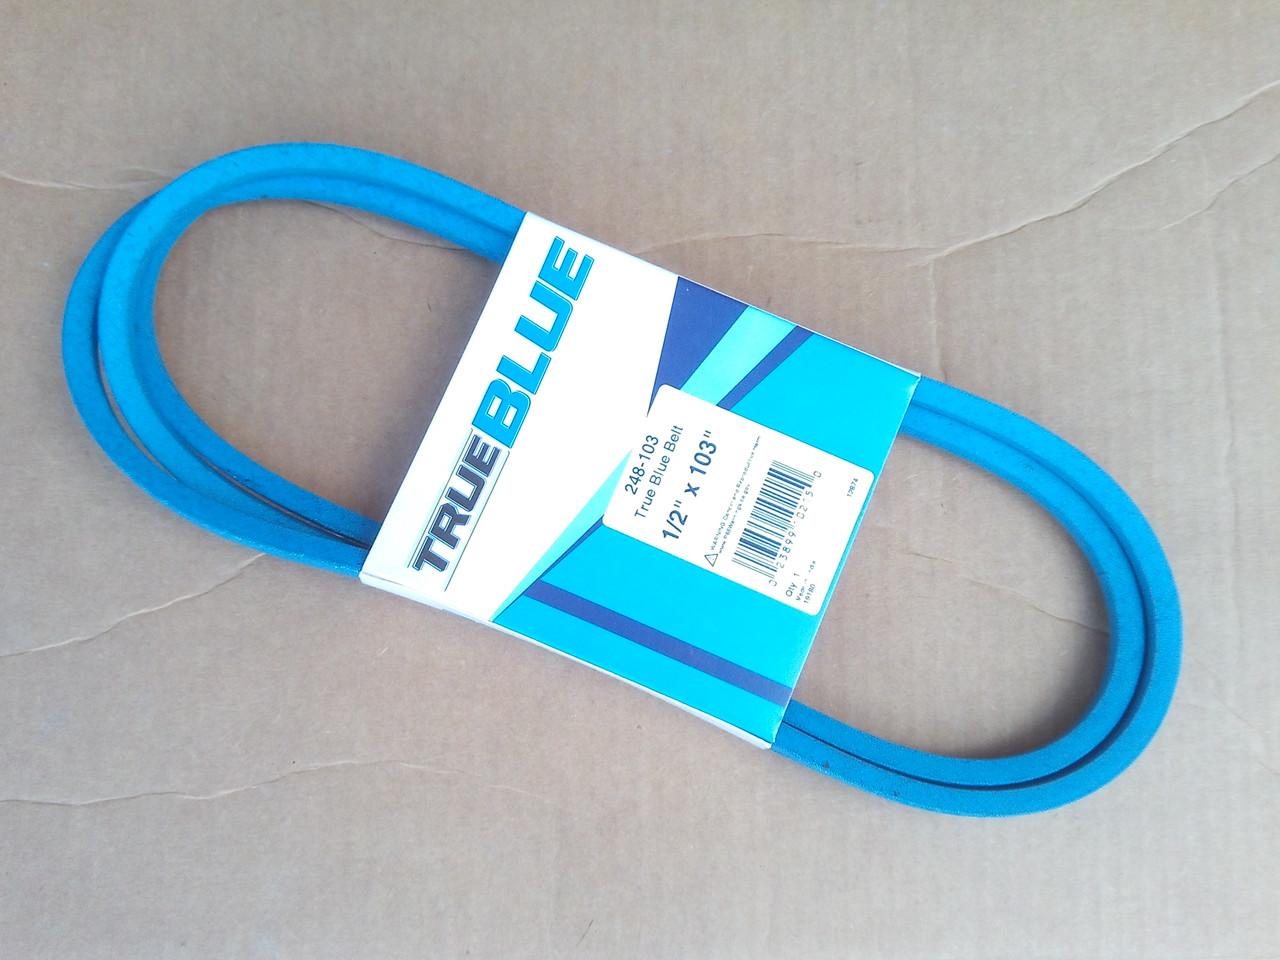 MTD or CUB CADET 754-3026 Replacement Belt